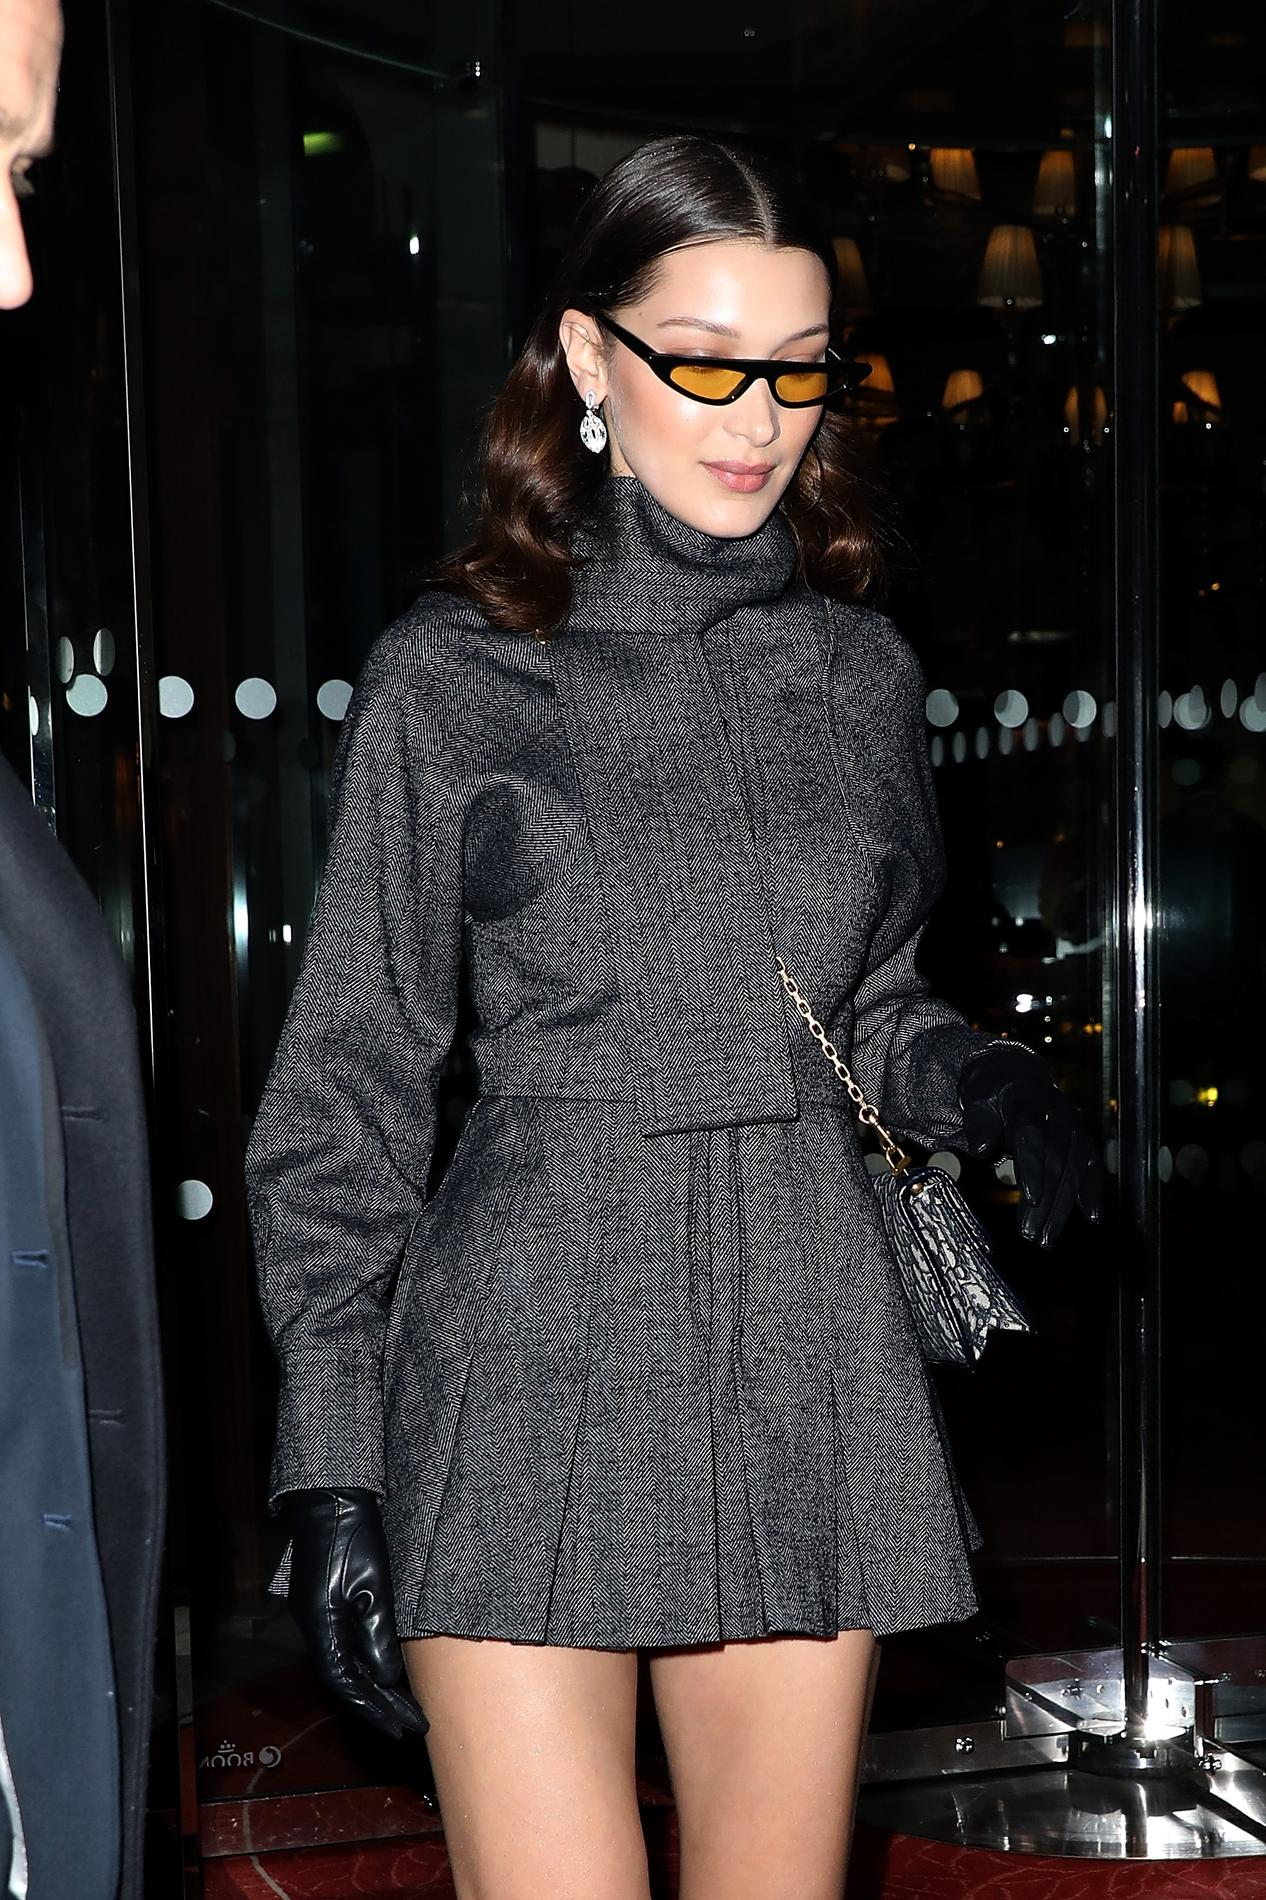 Audrey MossBella Icônes S'inspire Hadid… Des De HepburnKate On OPuTXZki